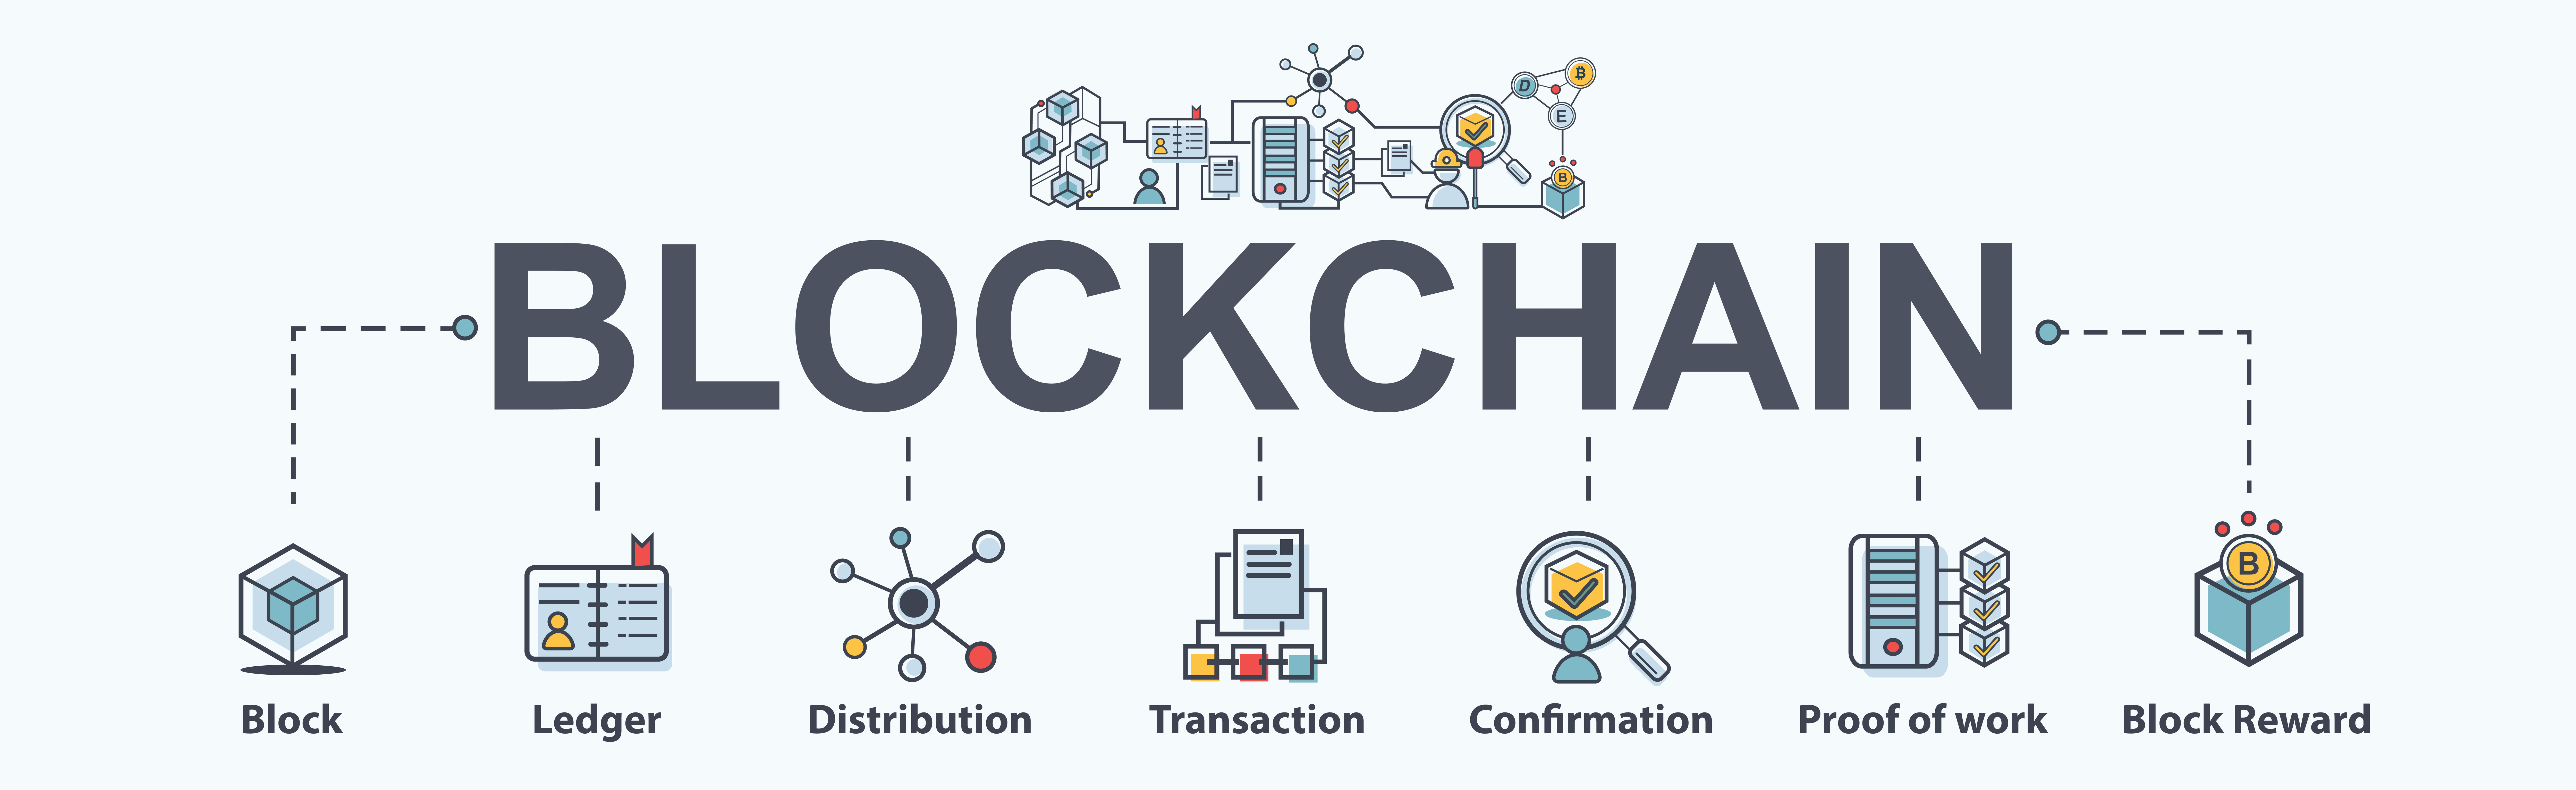 hamilton blockchain company banner